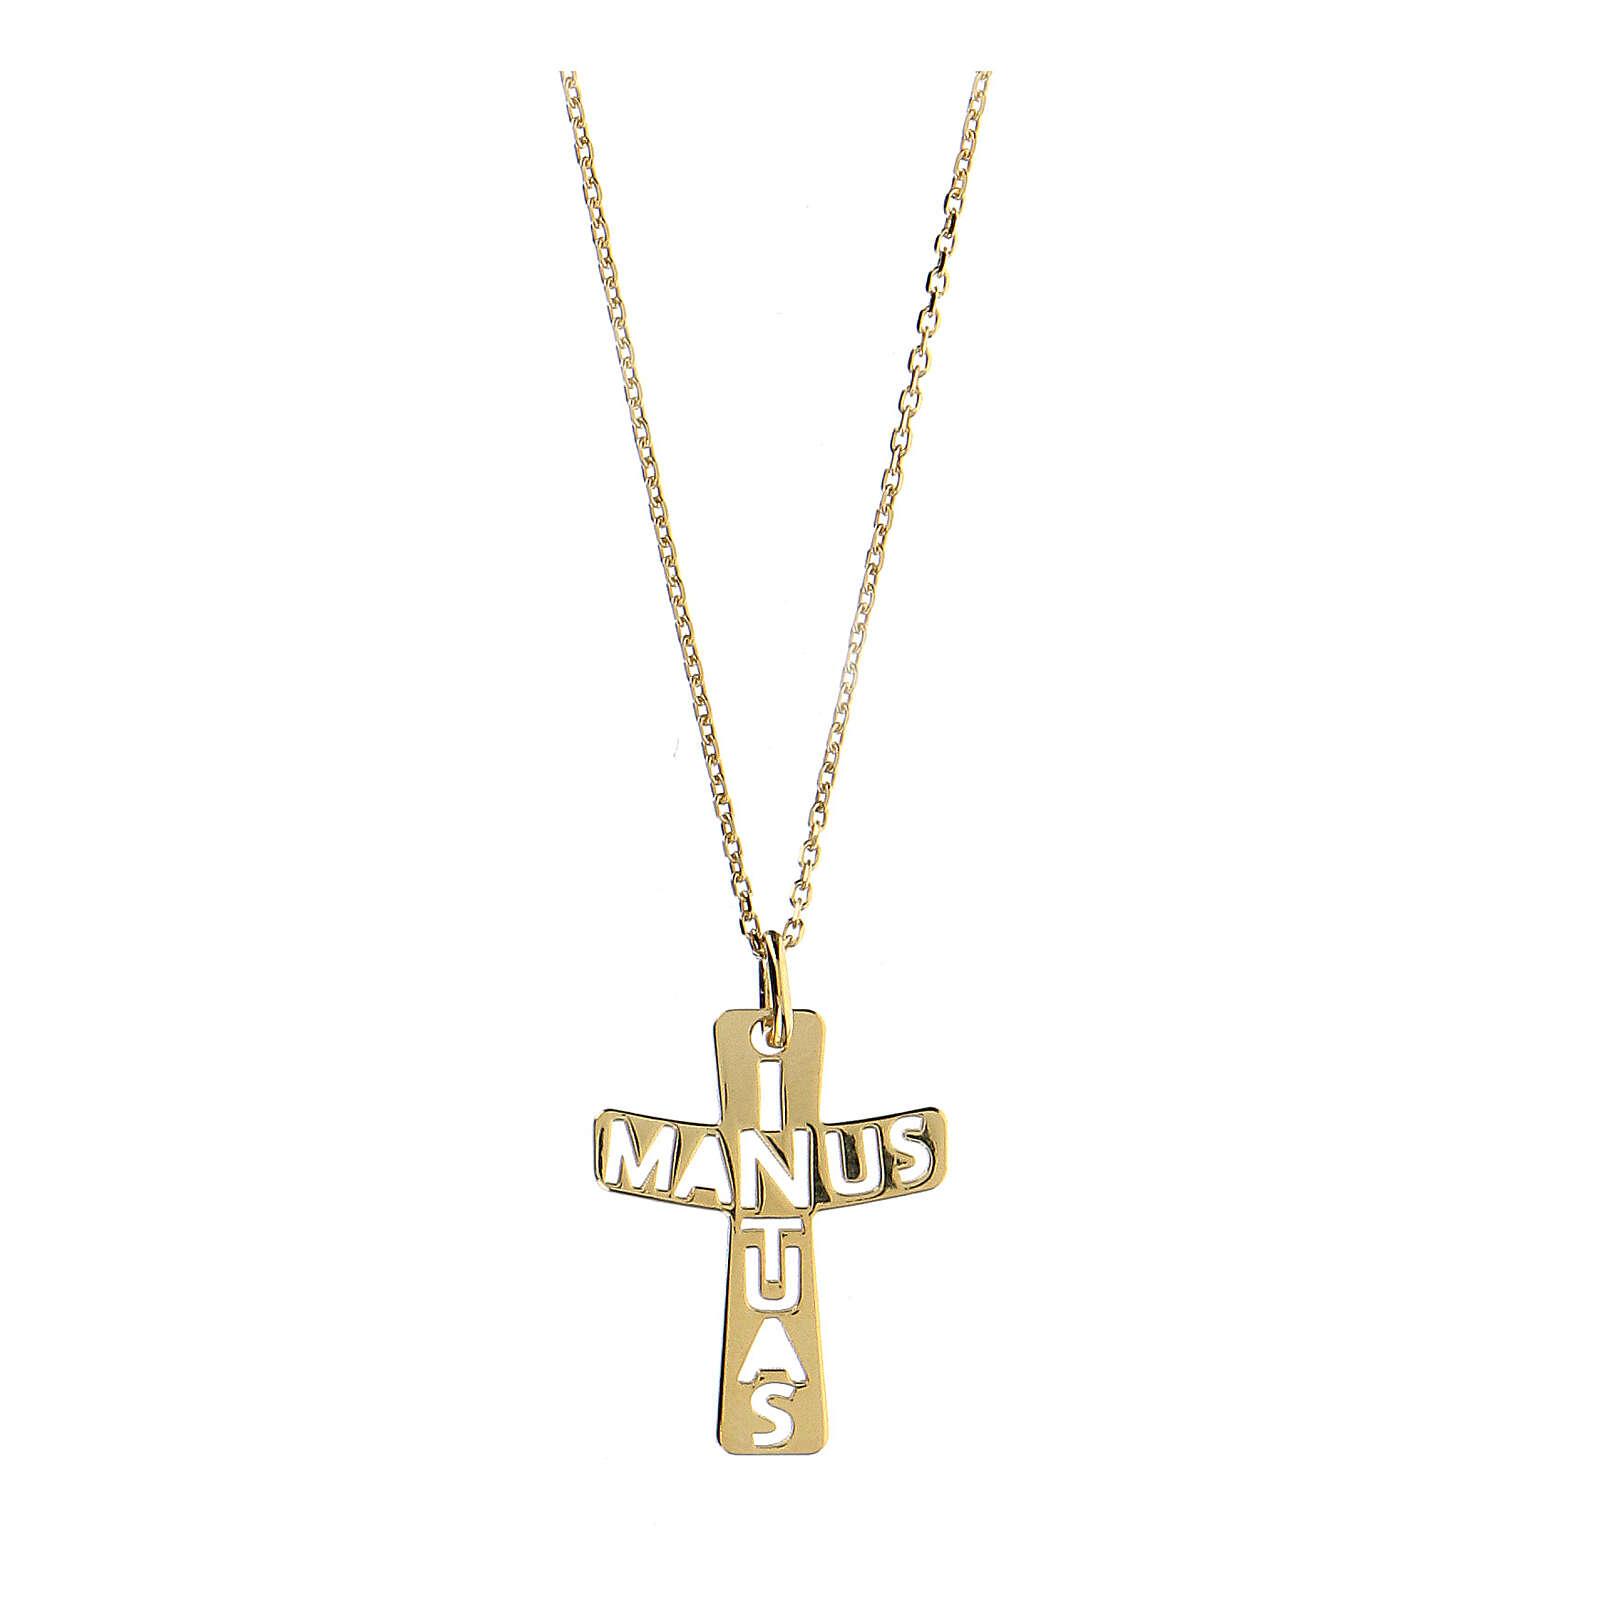 Croce argento 925 dorato In Manus Tuas traforata 4